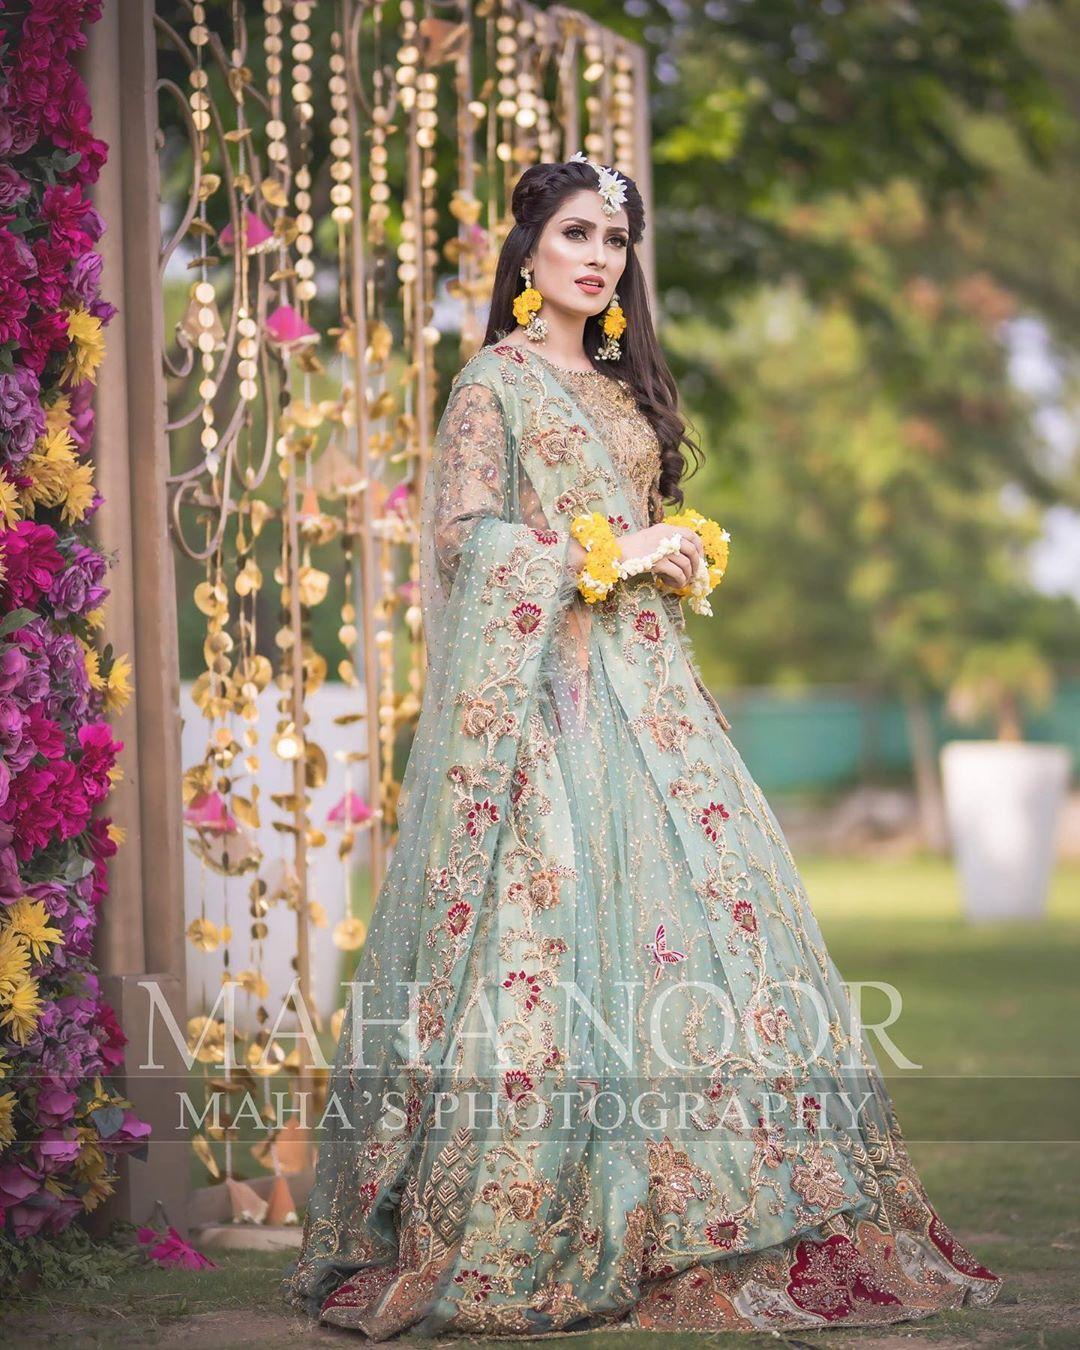 Beauty Queen Ayeza Khan Stunning Looks in New Bridal Photo Shoot